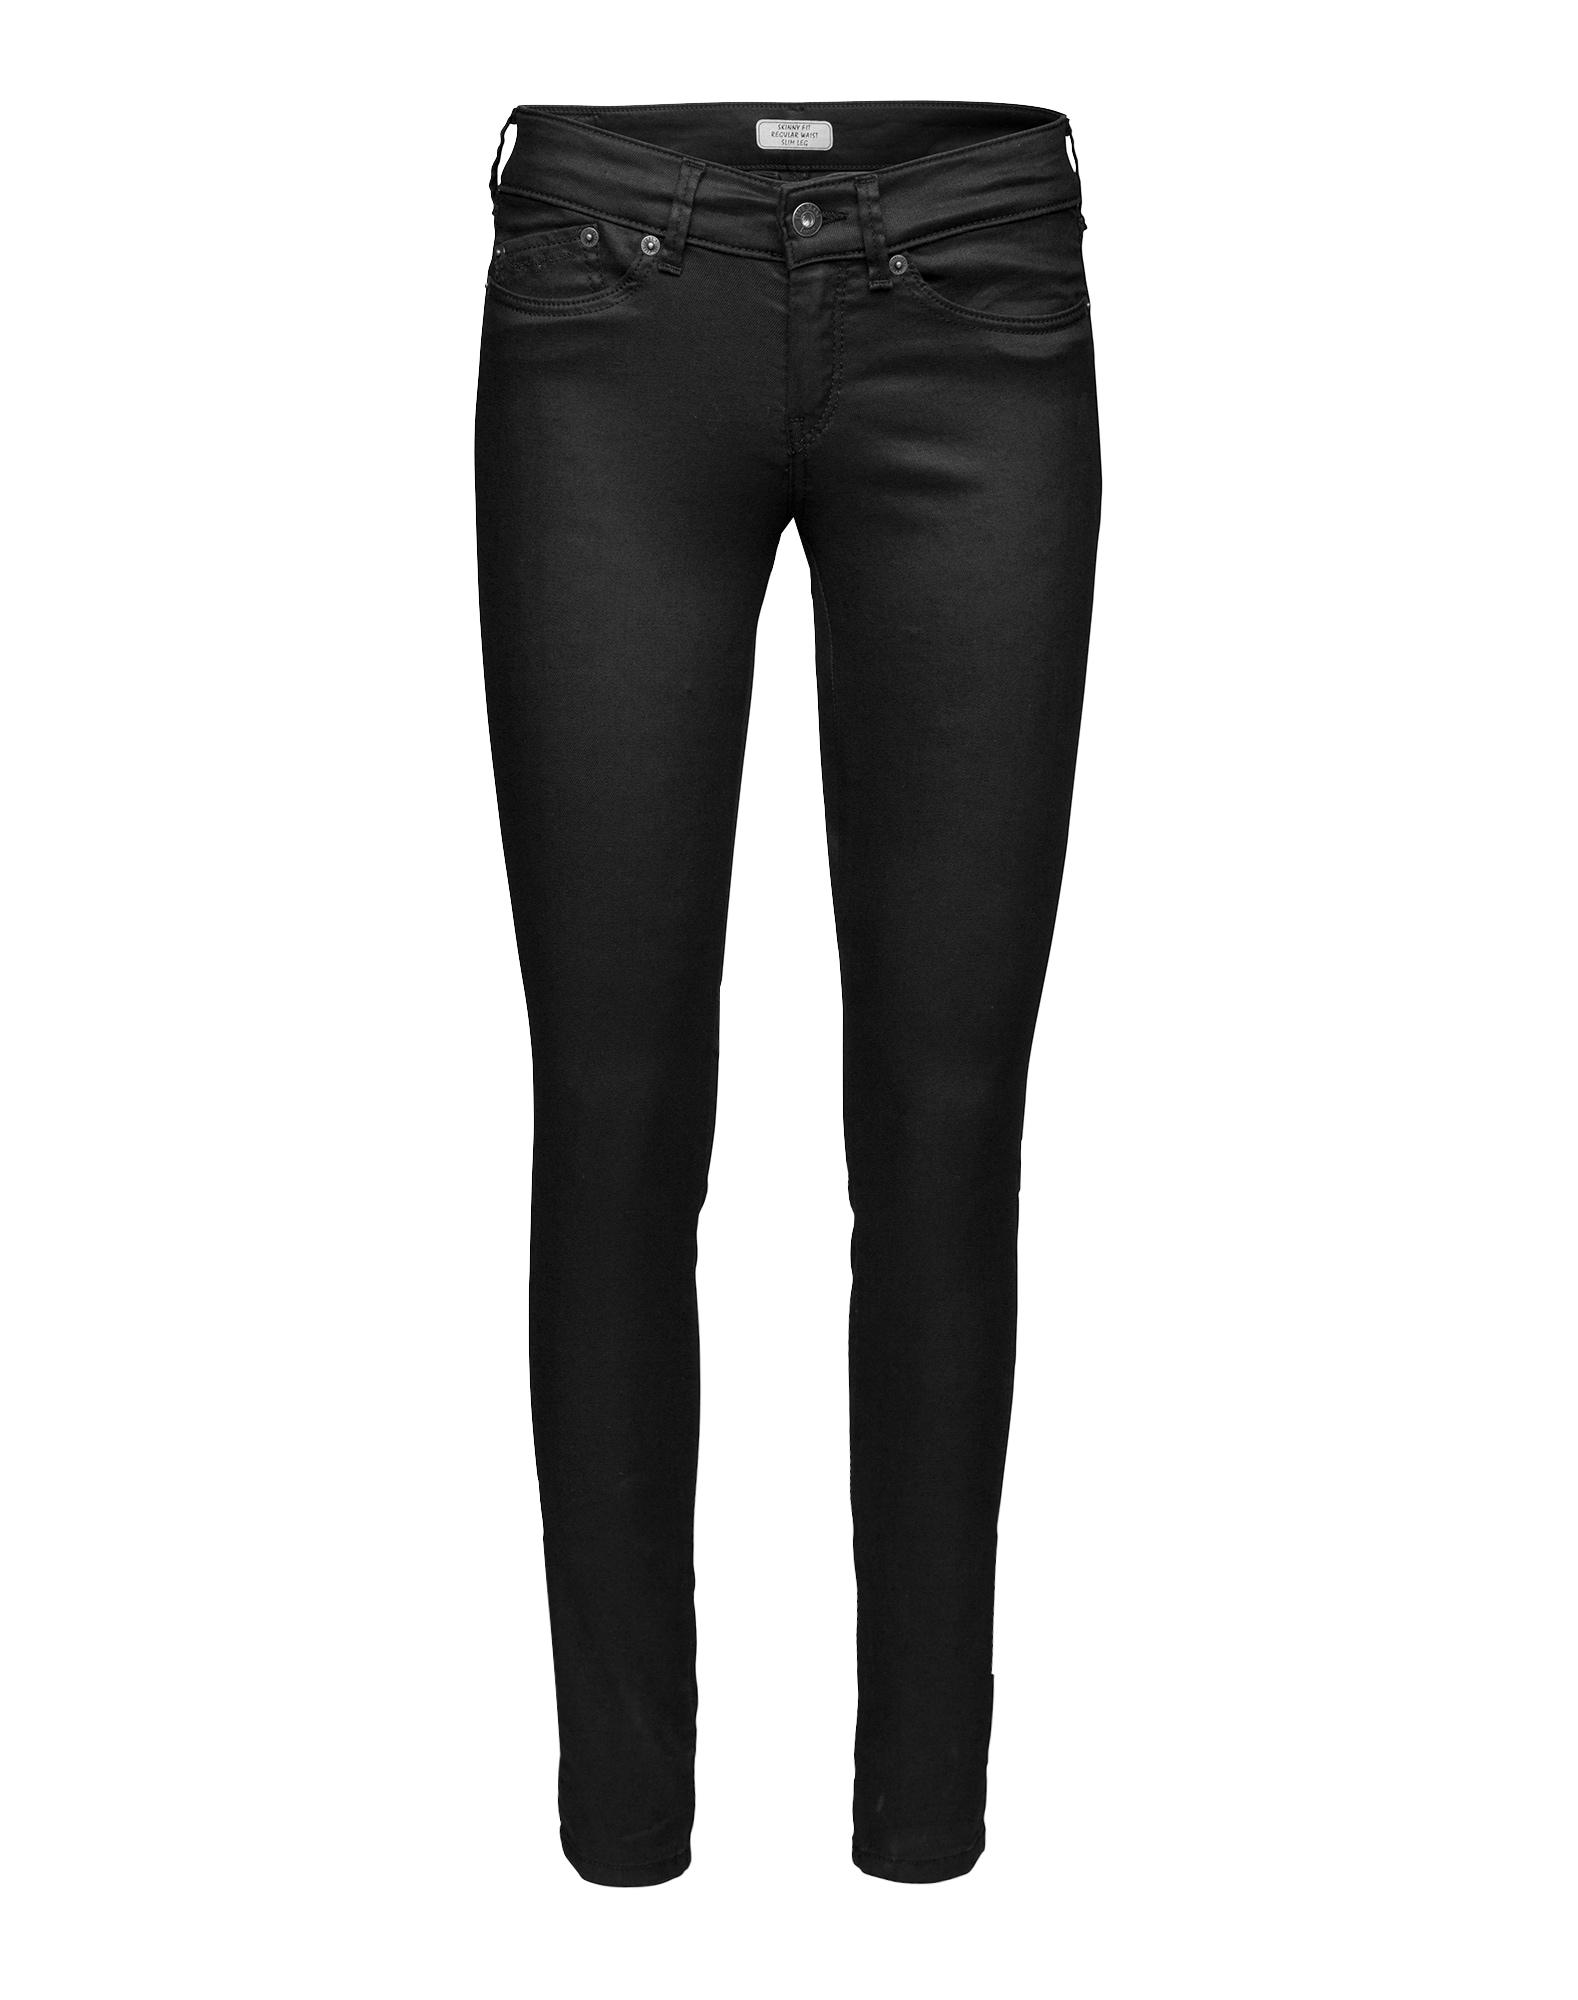 Pepe Jeans Dames Jeans Pixie zwart